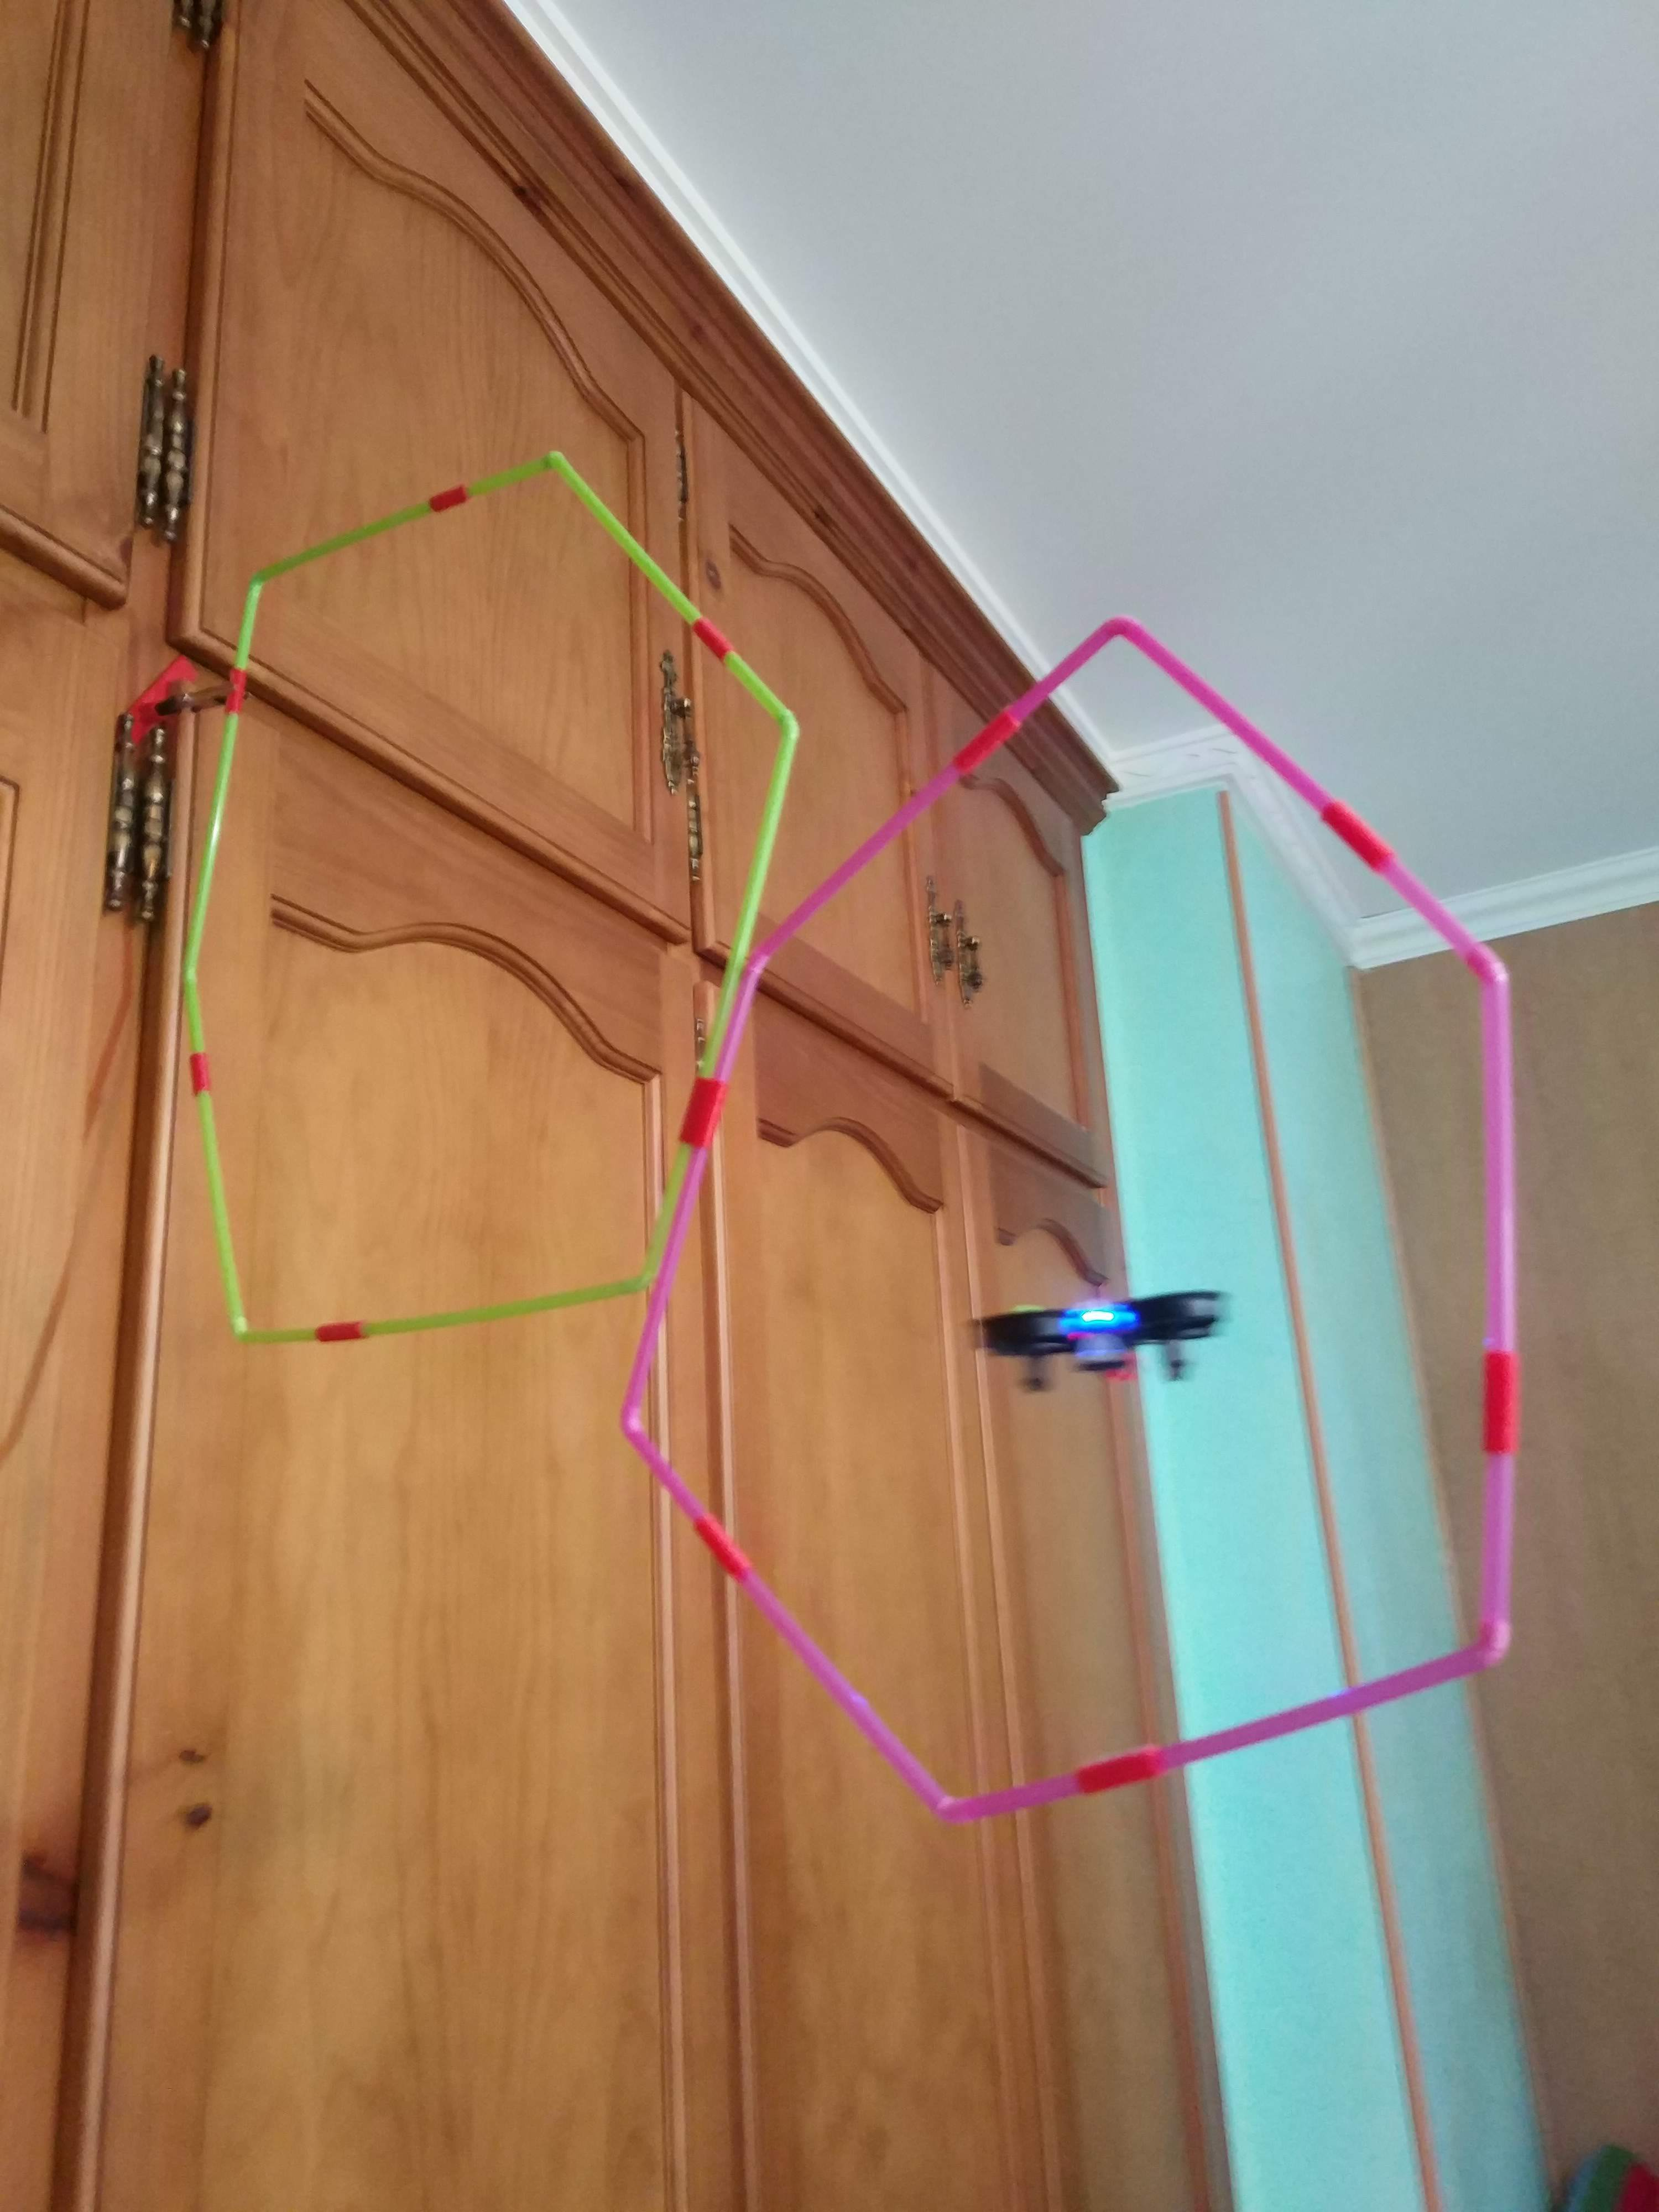 gate2.jpg Download free STL file Tiny whoop straw gate • 3D printer template, jarp1977